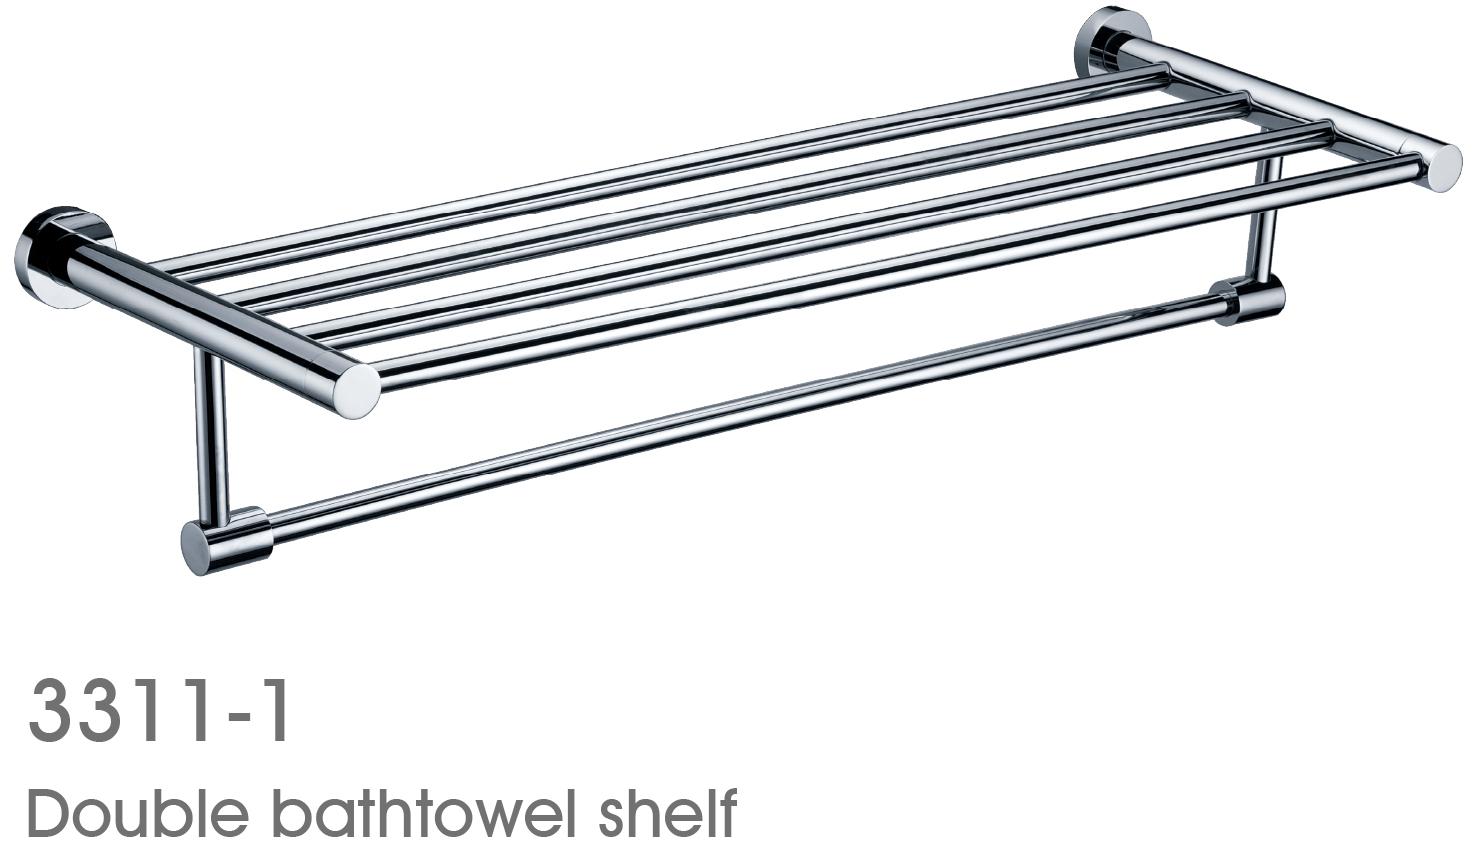 Exquisite Brass 25 Inch Bathroom Shelf With Towel Bar Bathroom Accessories